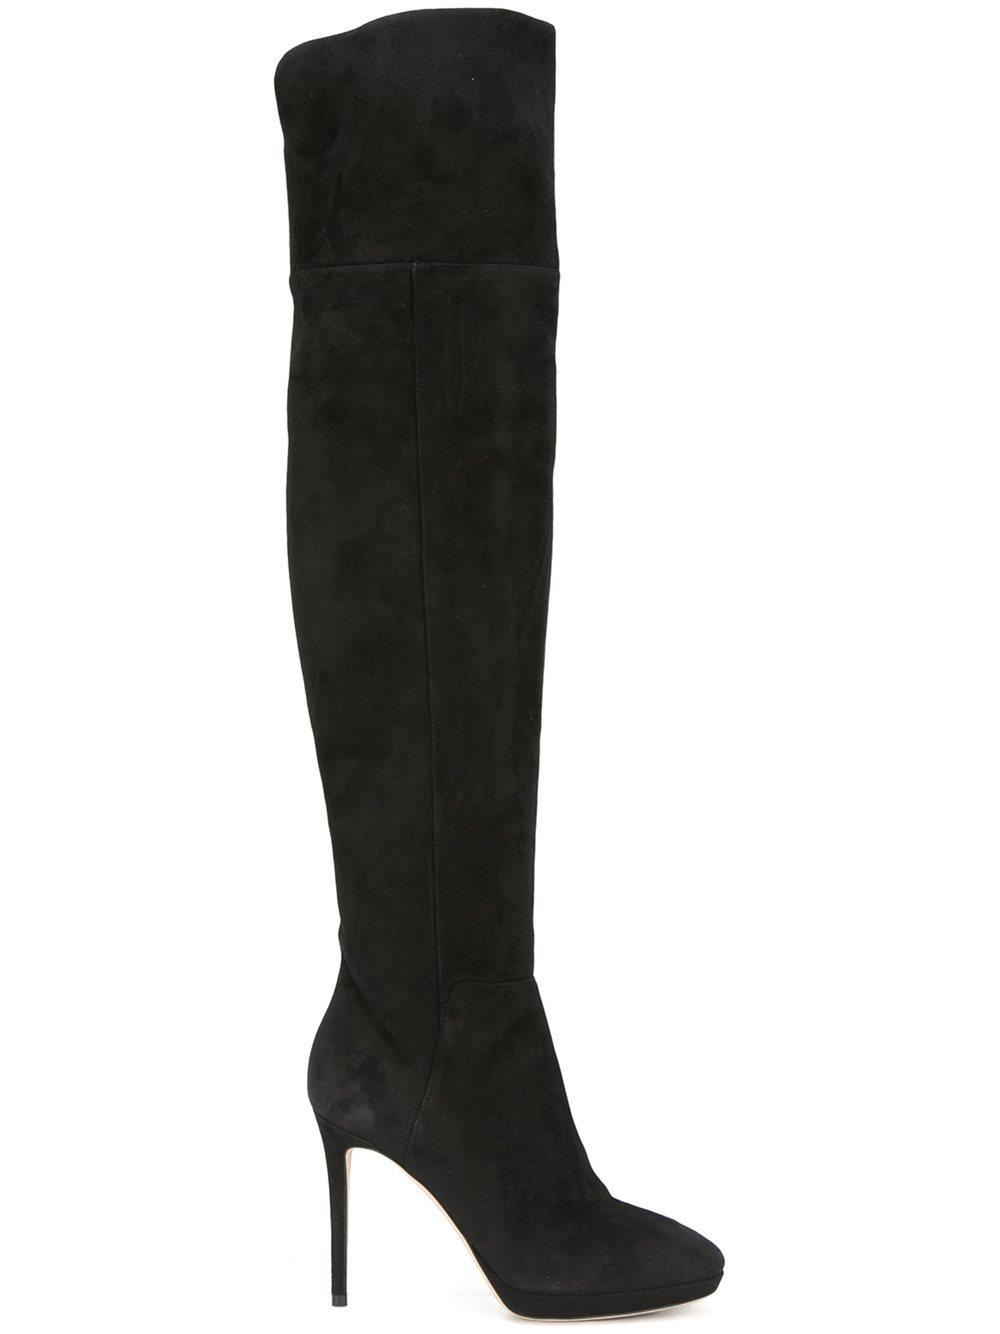 jimmy choo hayley 100 thigh high boots in black lyst